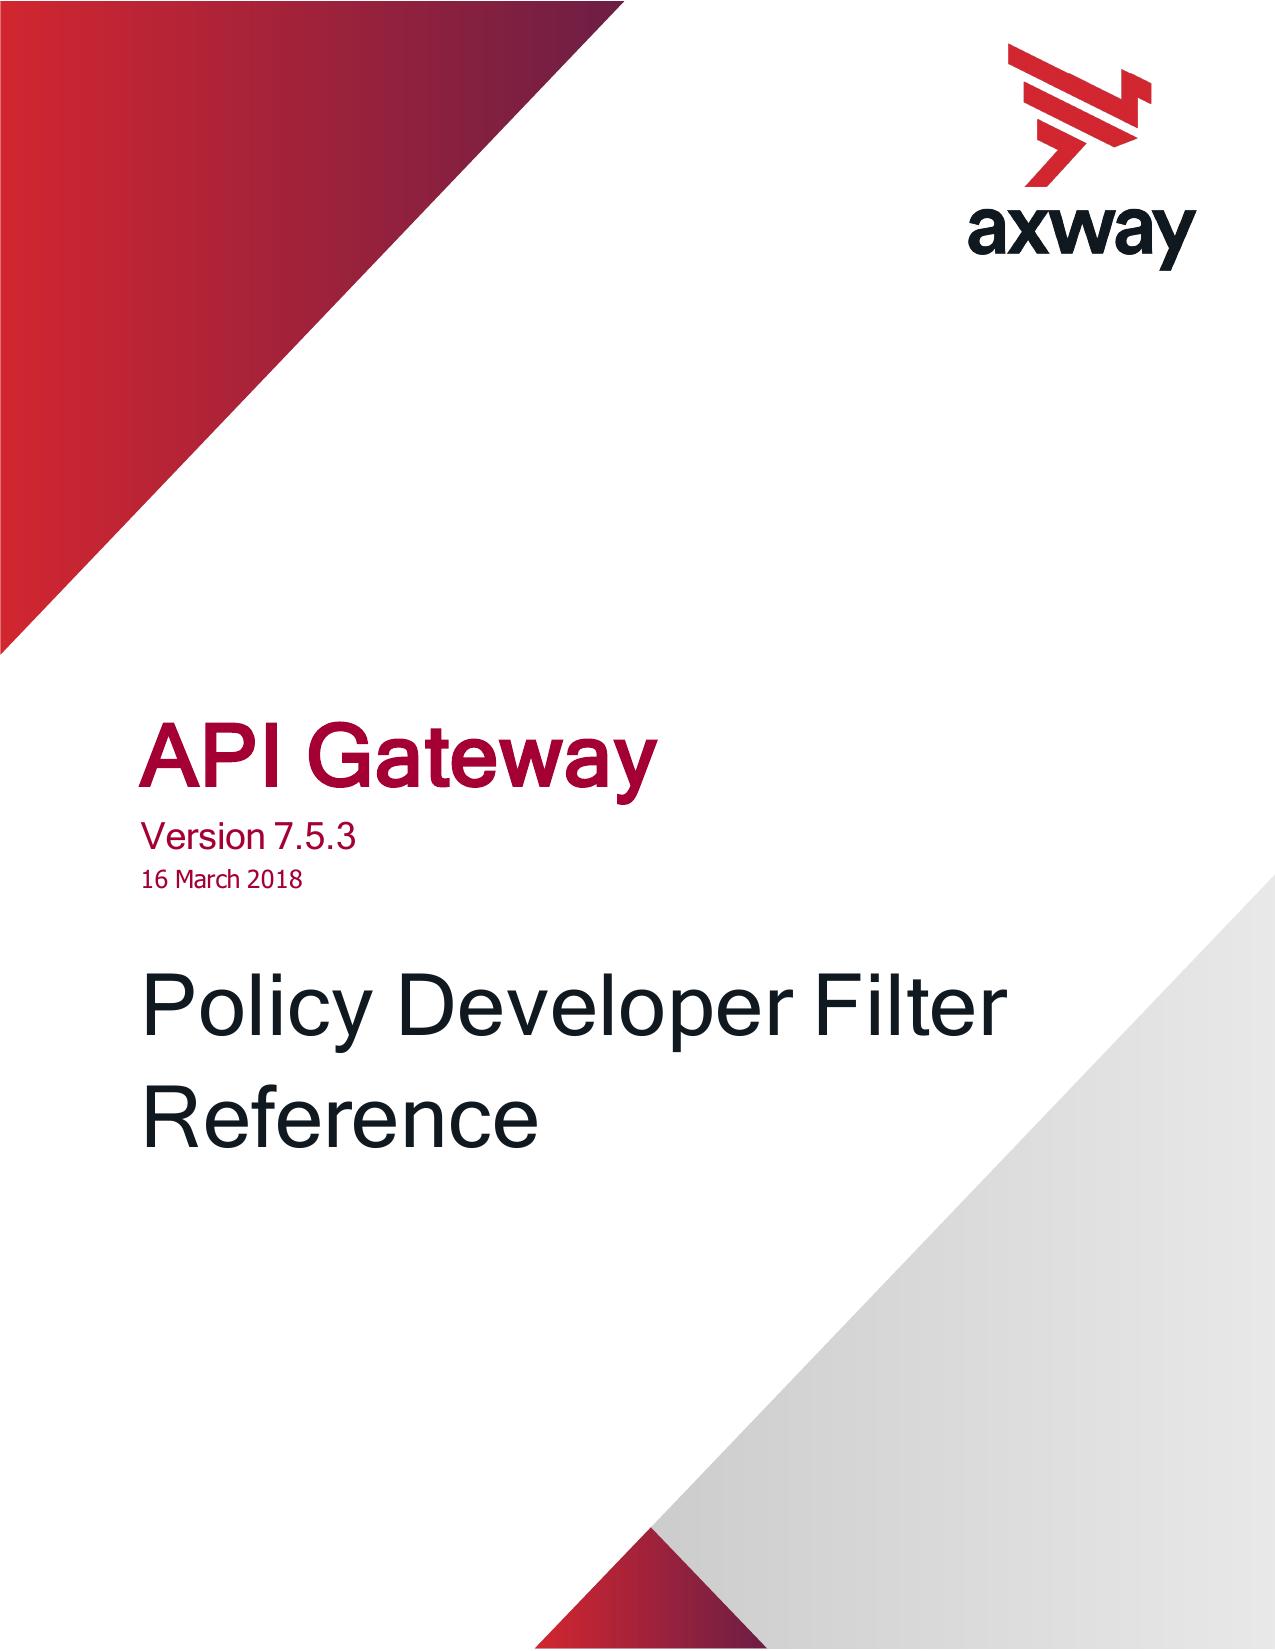 Axway API Gateway Policy Developer Filter Reference | manualzz com